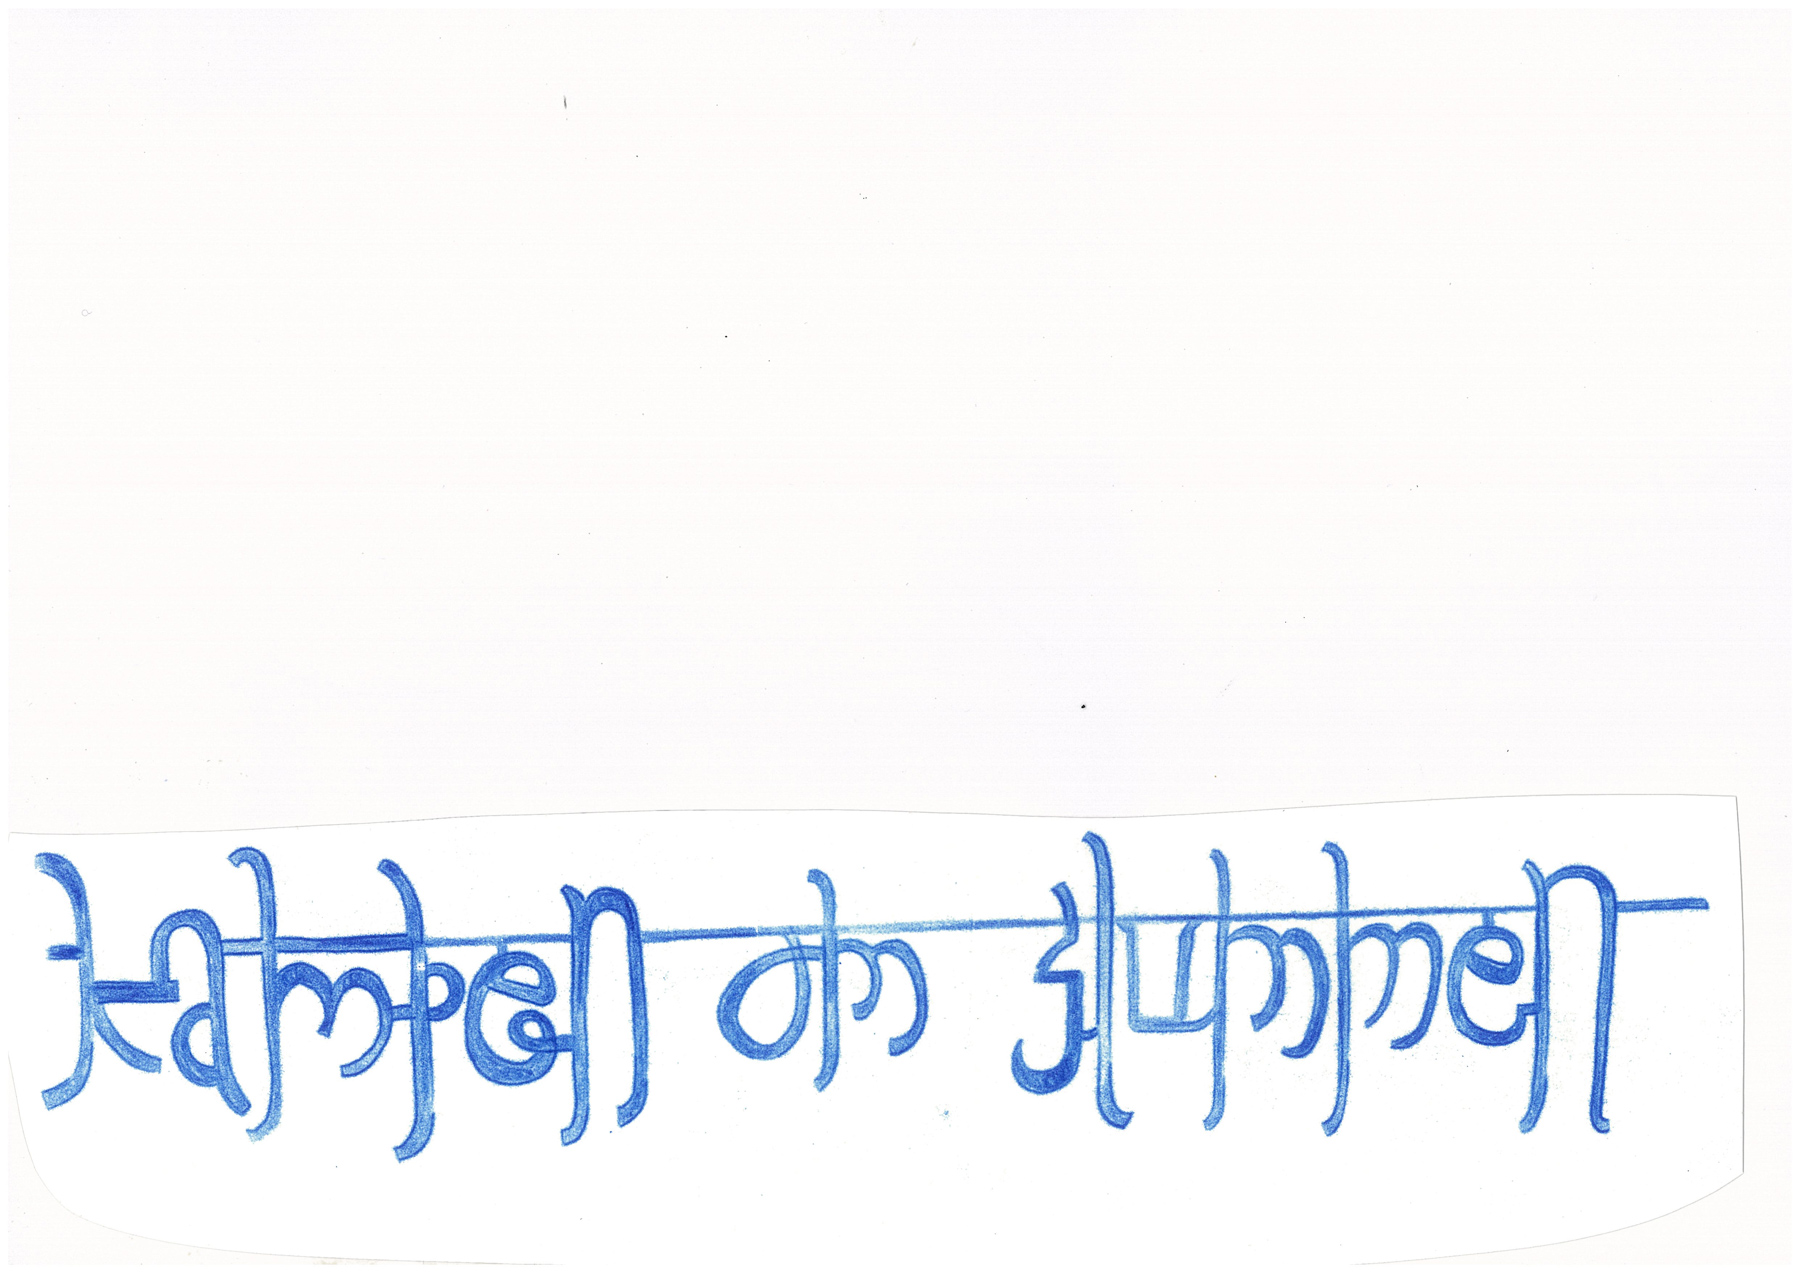 """DharaviMumbai"", Journalistbureauet TANK, 2016"